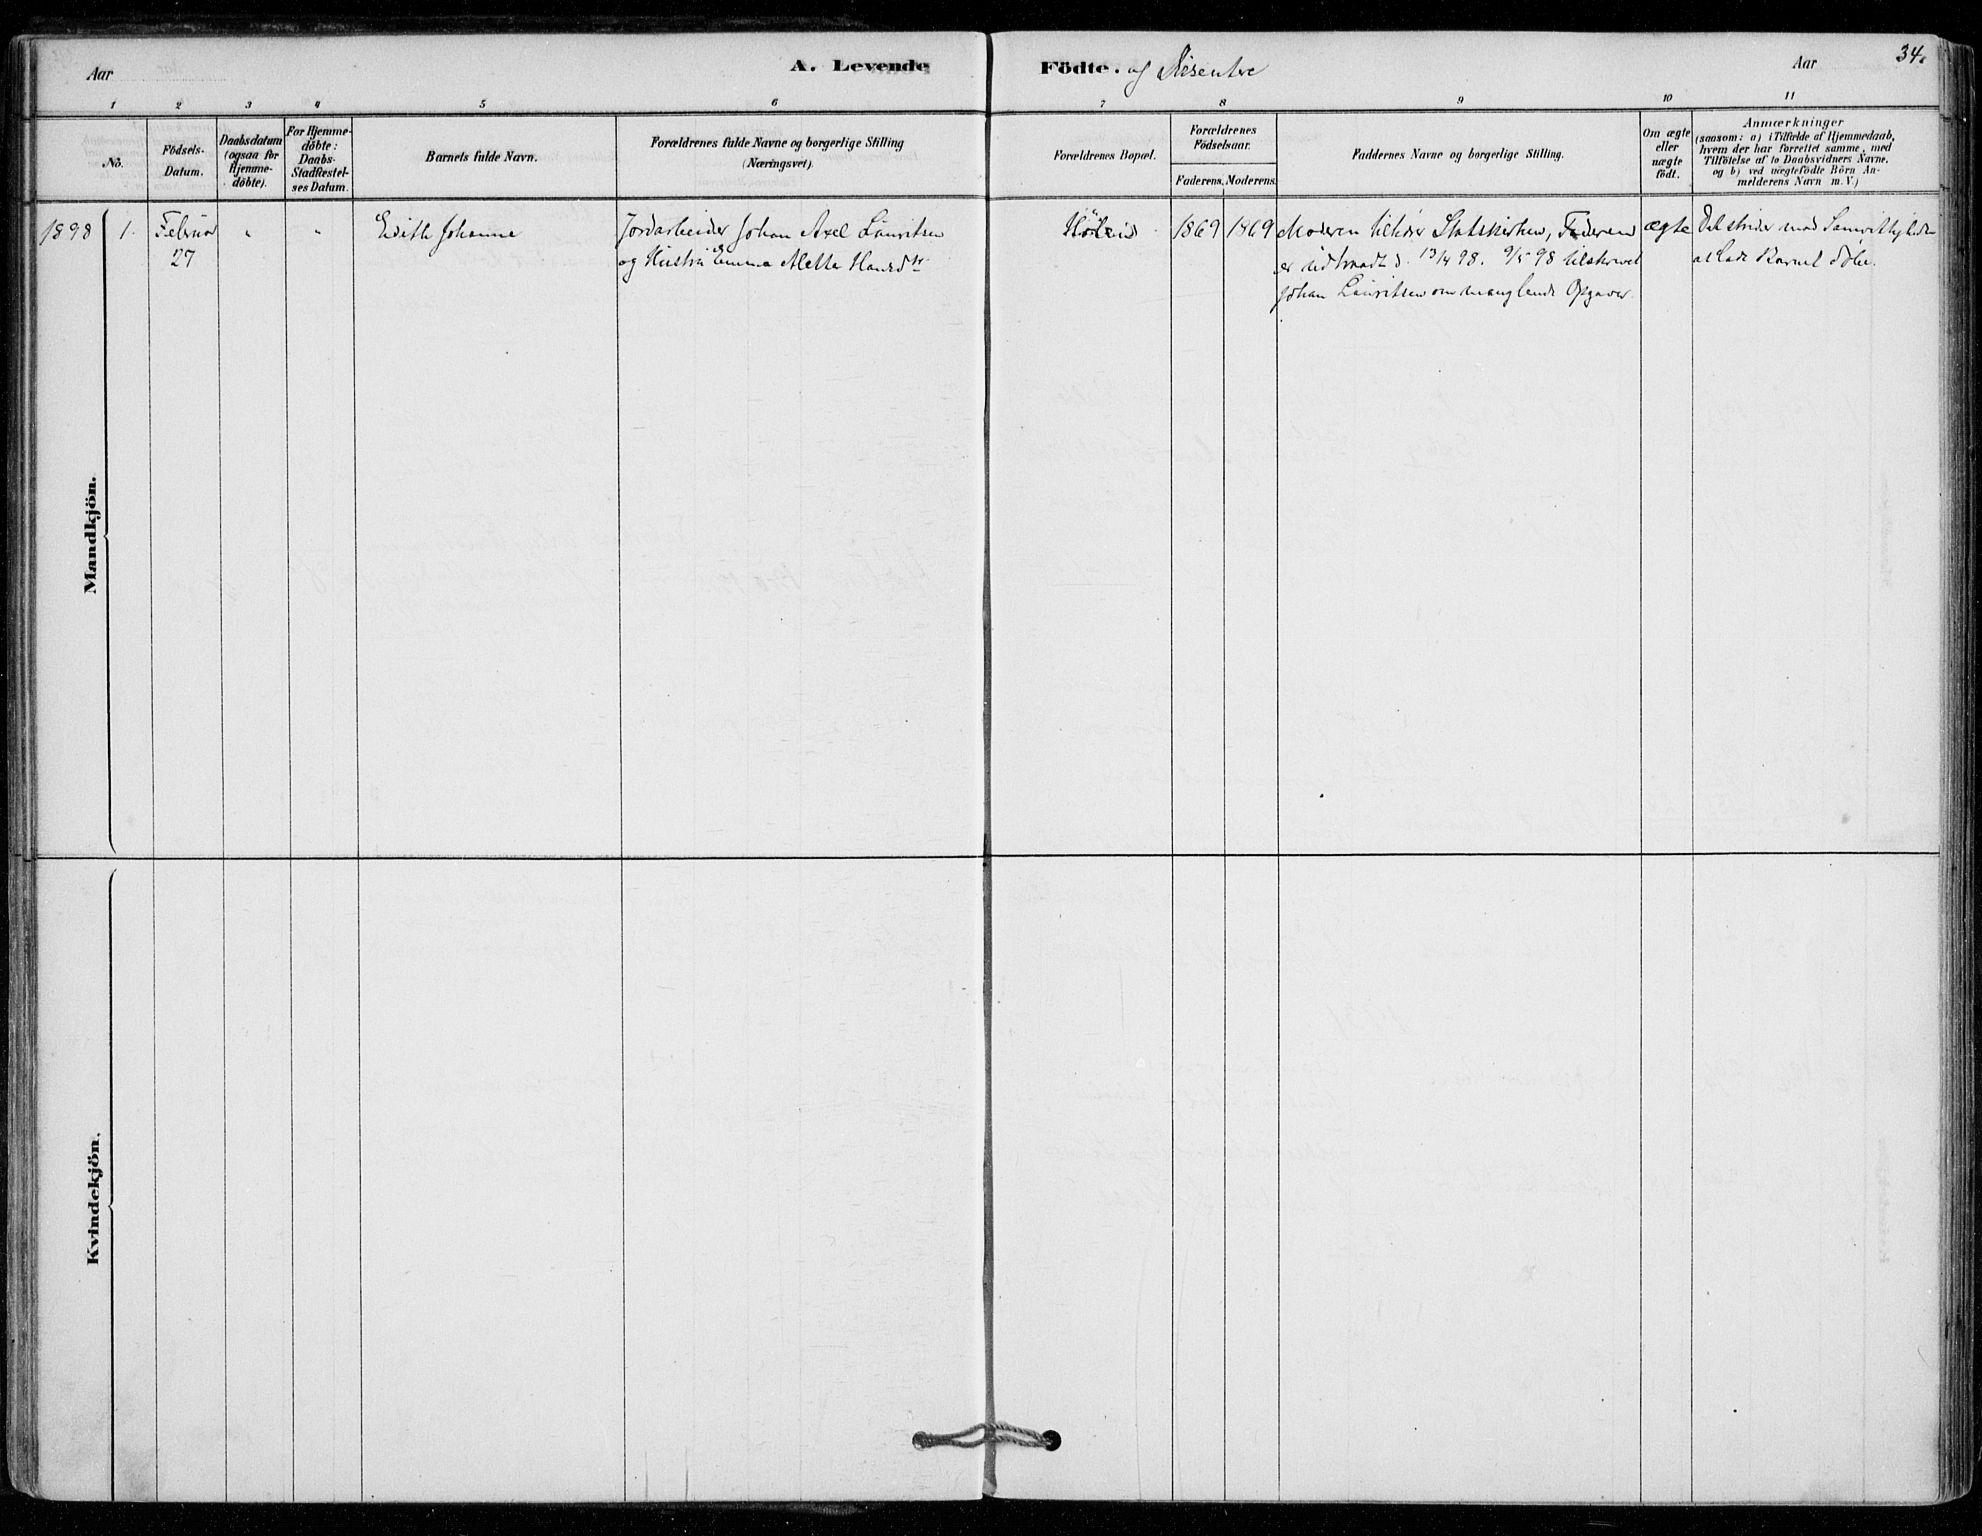 SAO, Vestby prestekontor Kirkebøker, F/Fe/L0001: Ministerialbok nr. V 1, 1878-1931, s. 34